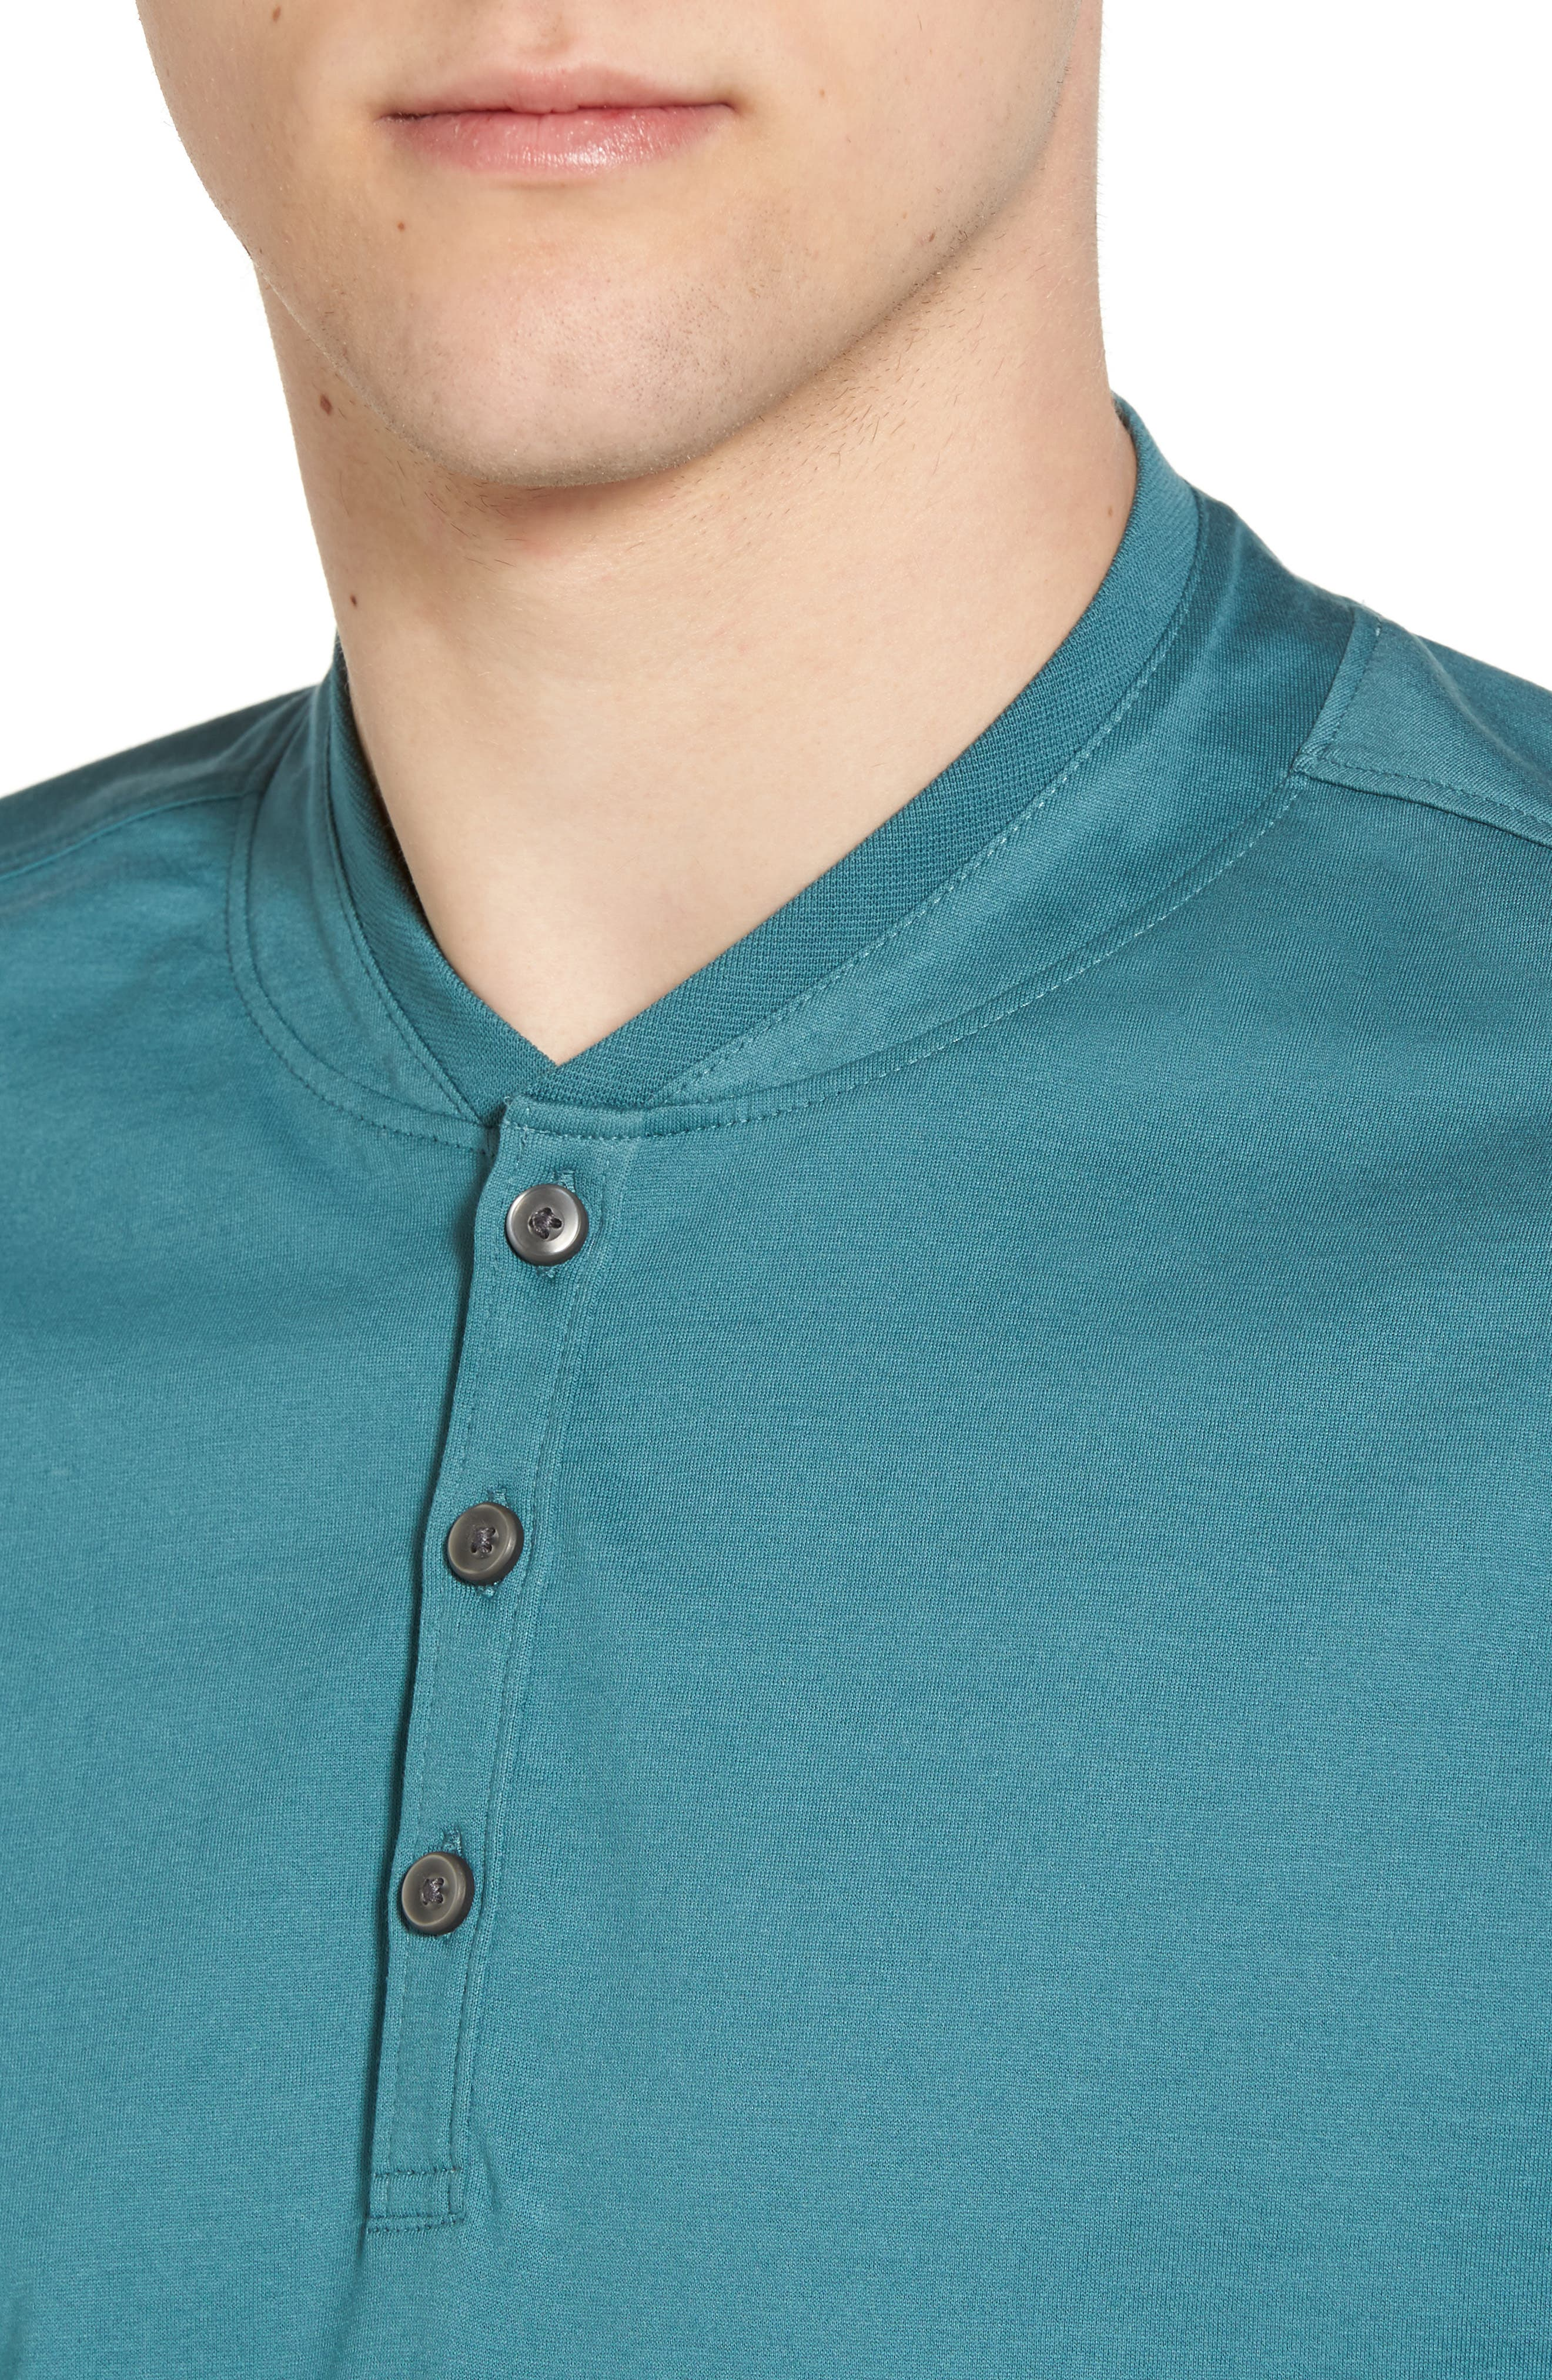 Trim Fit Fashion Polo,                             Alternate thumbnail 4, color,                             Teal Hydro